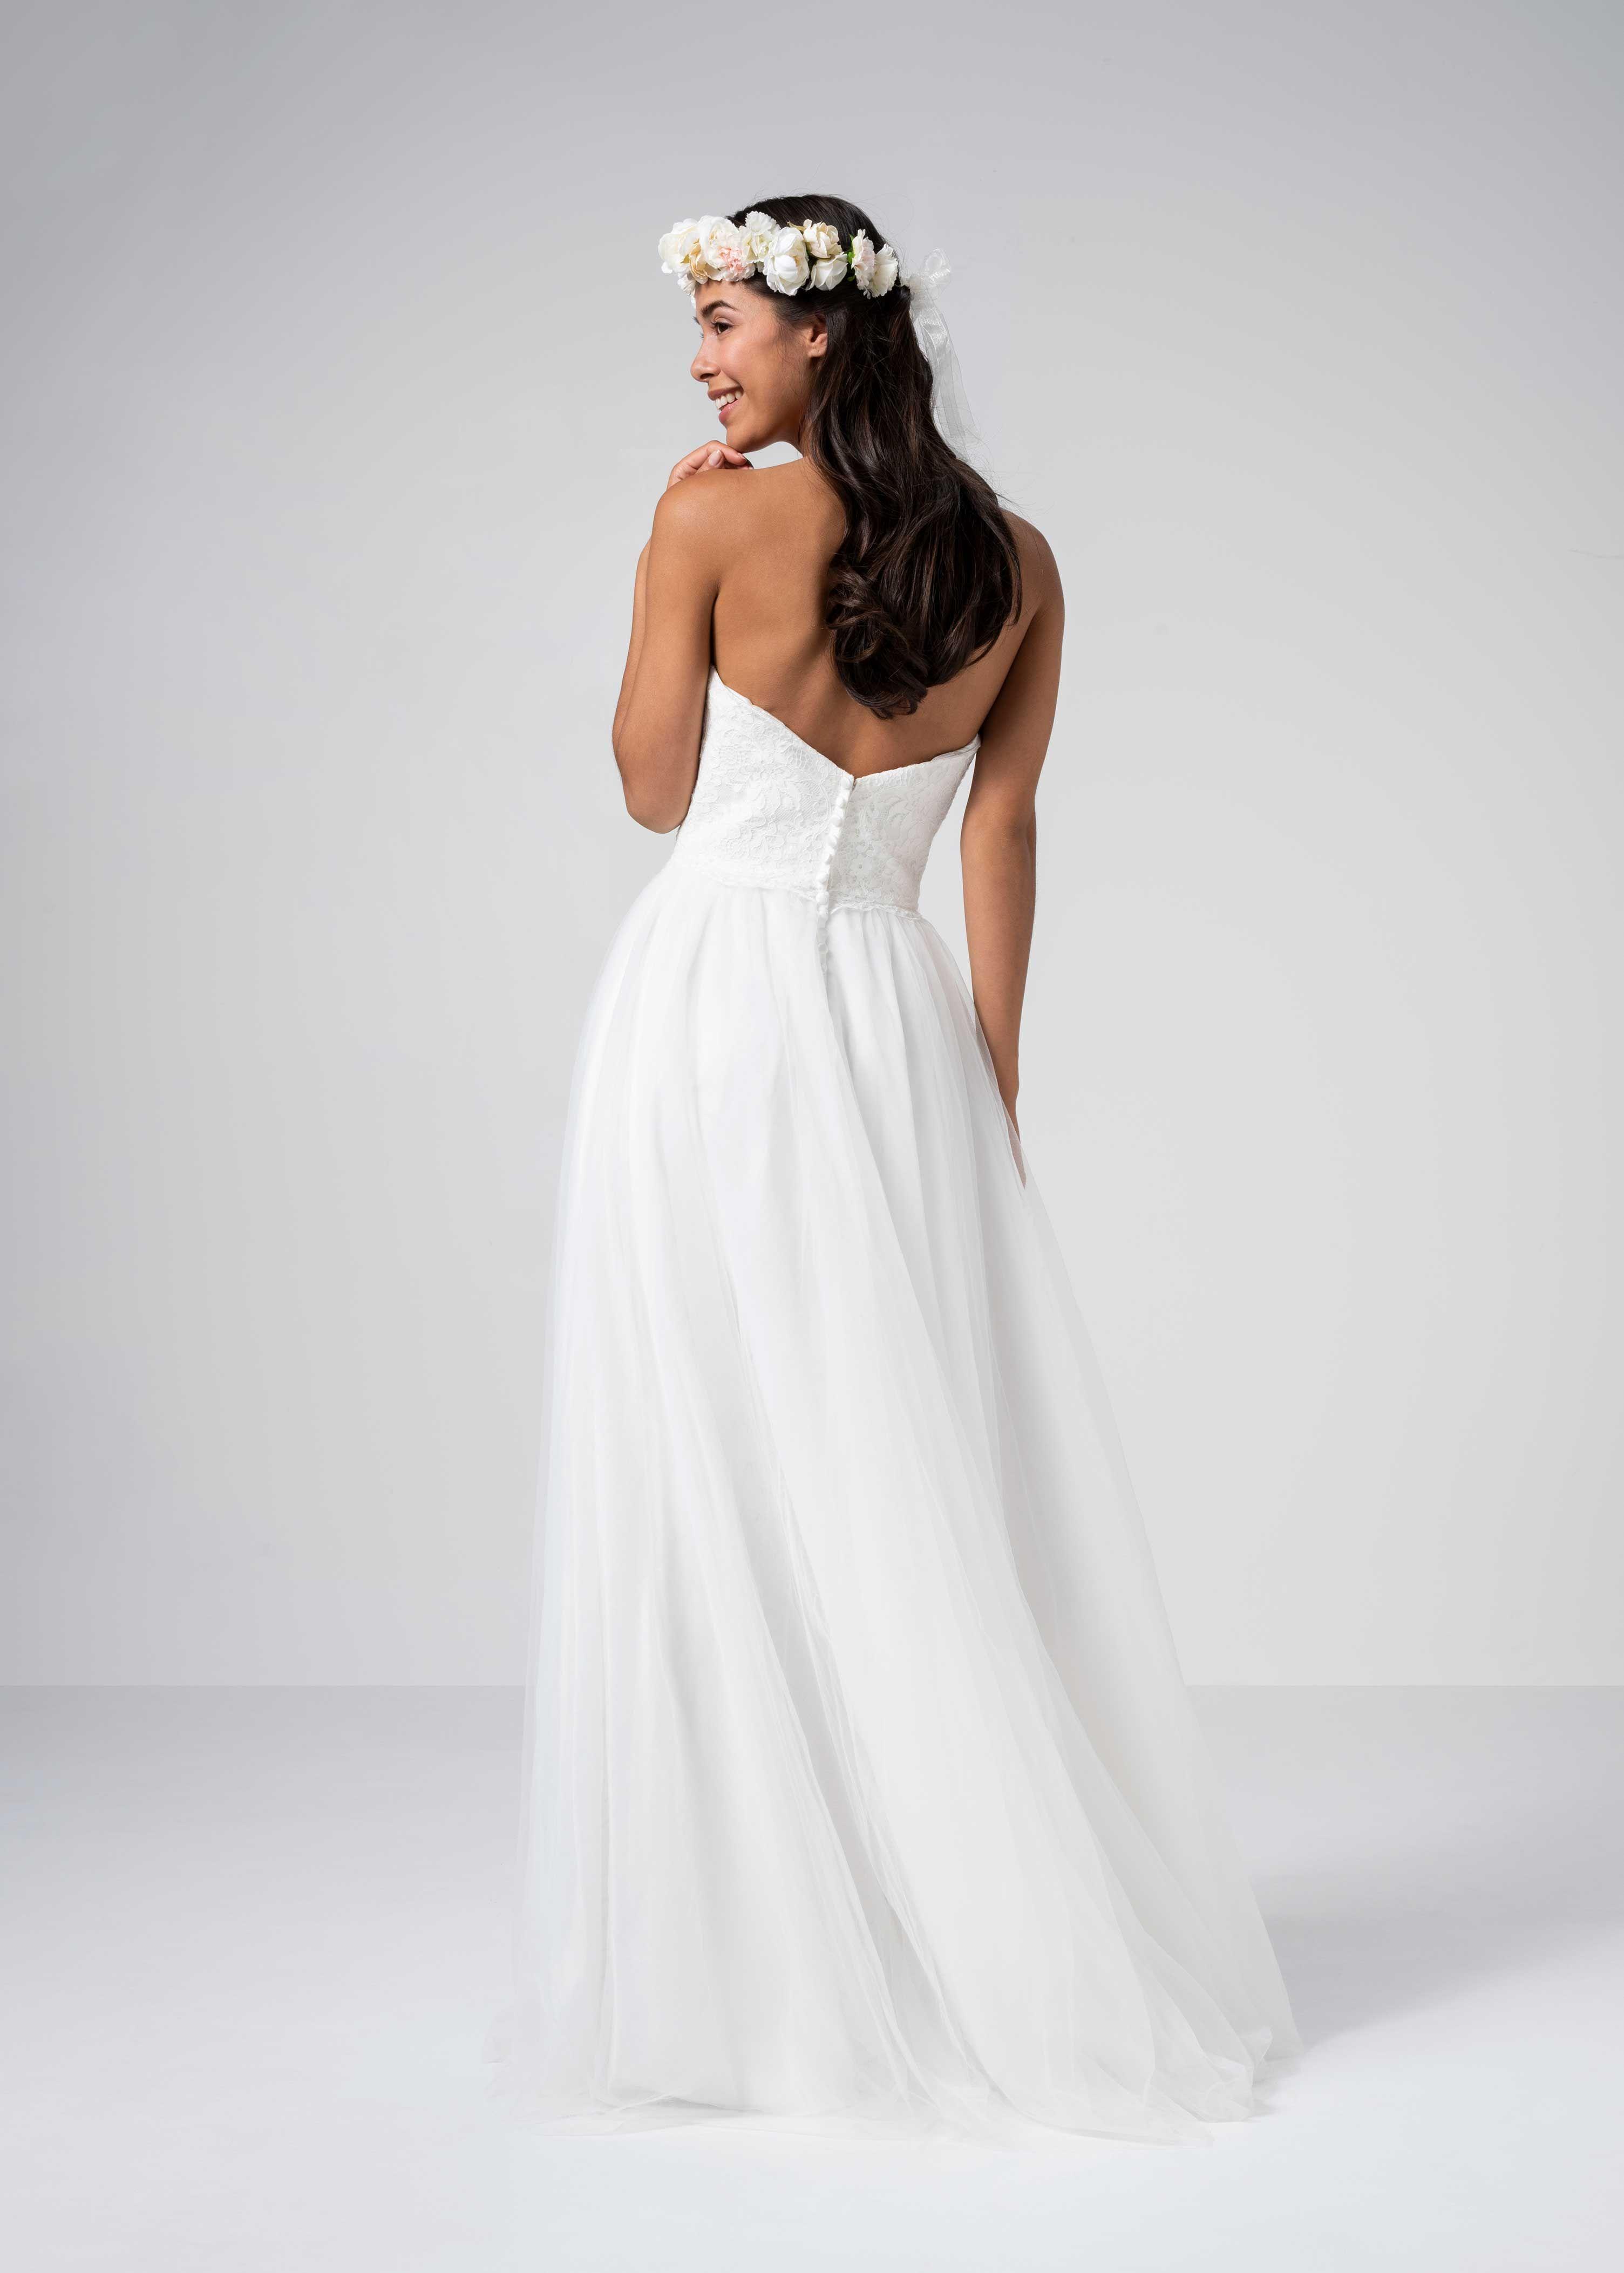 Romantic Bridal Dress for all 10 Bride  Brautmode, Braut, Mode